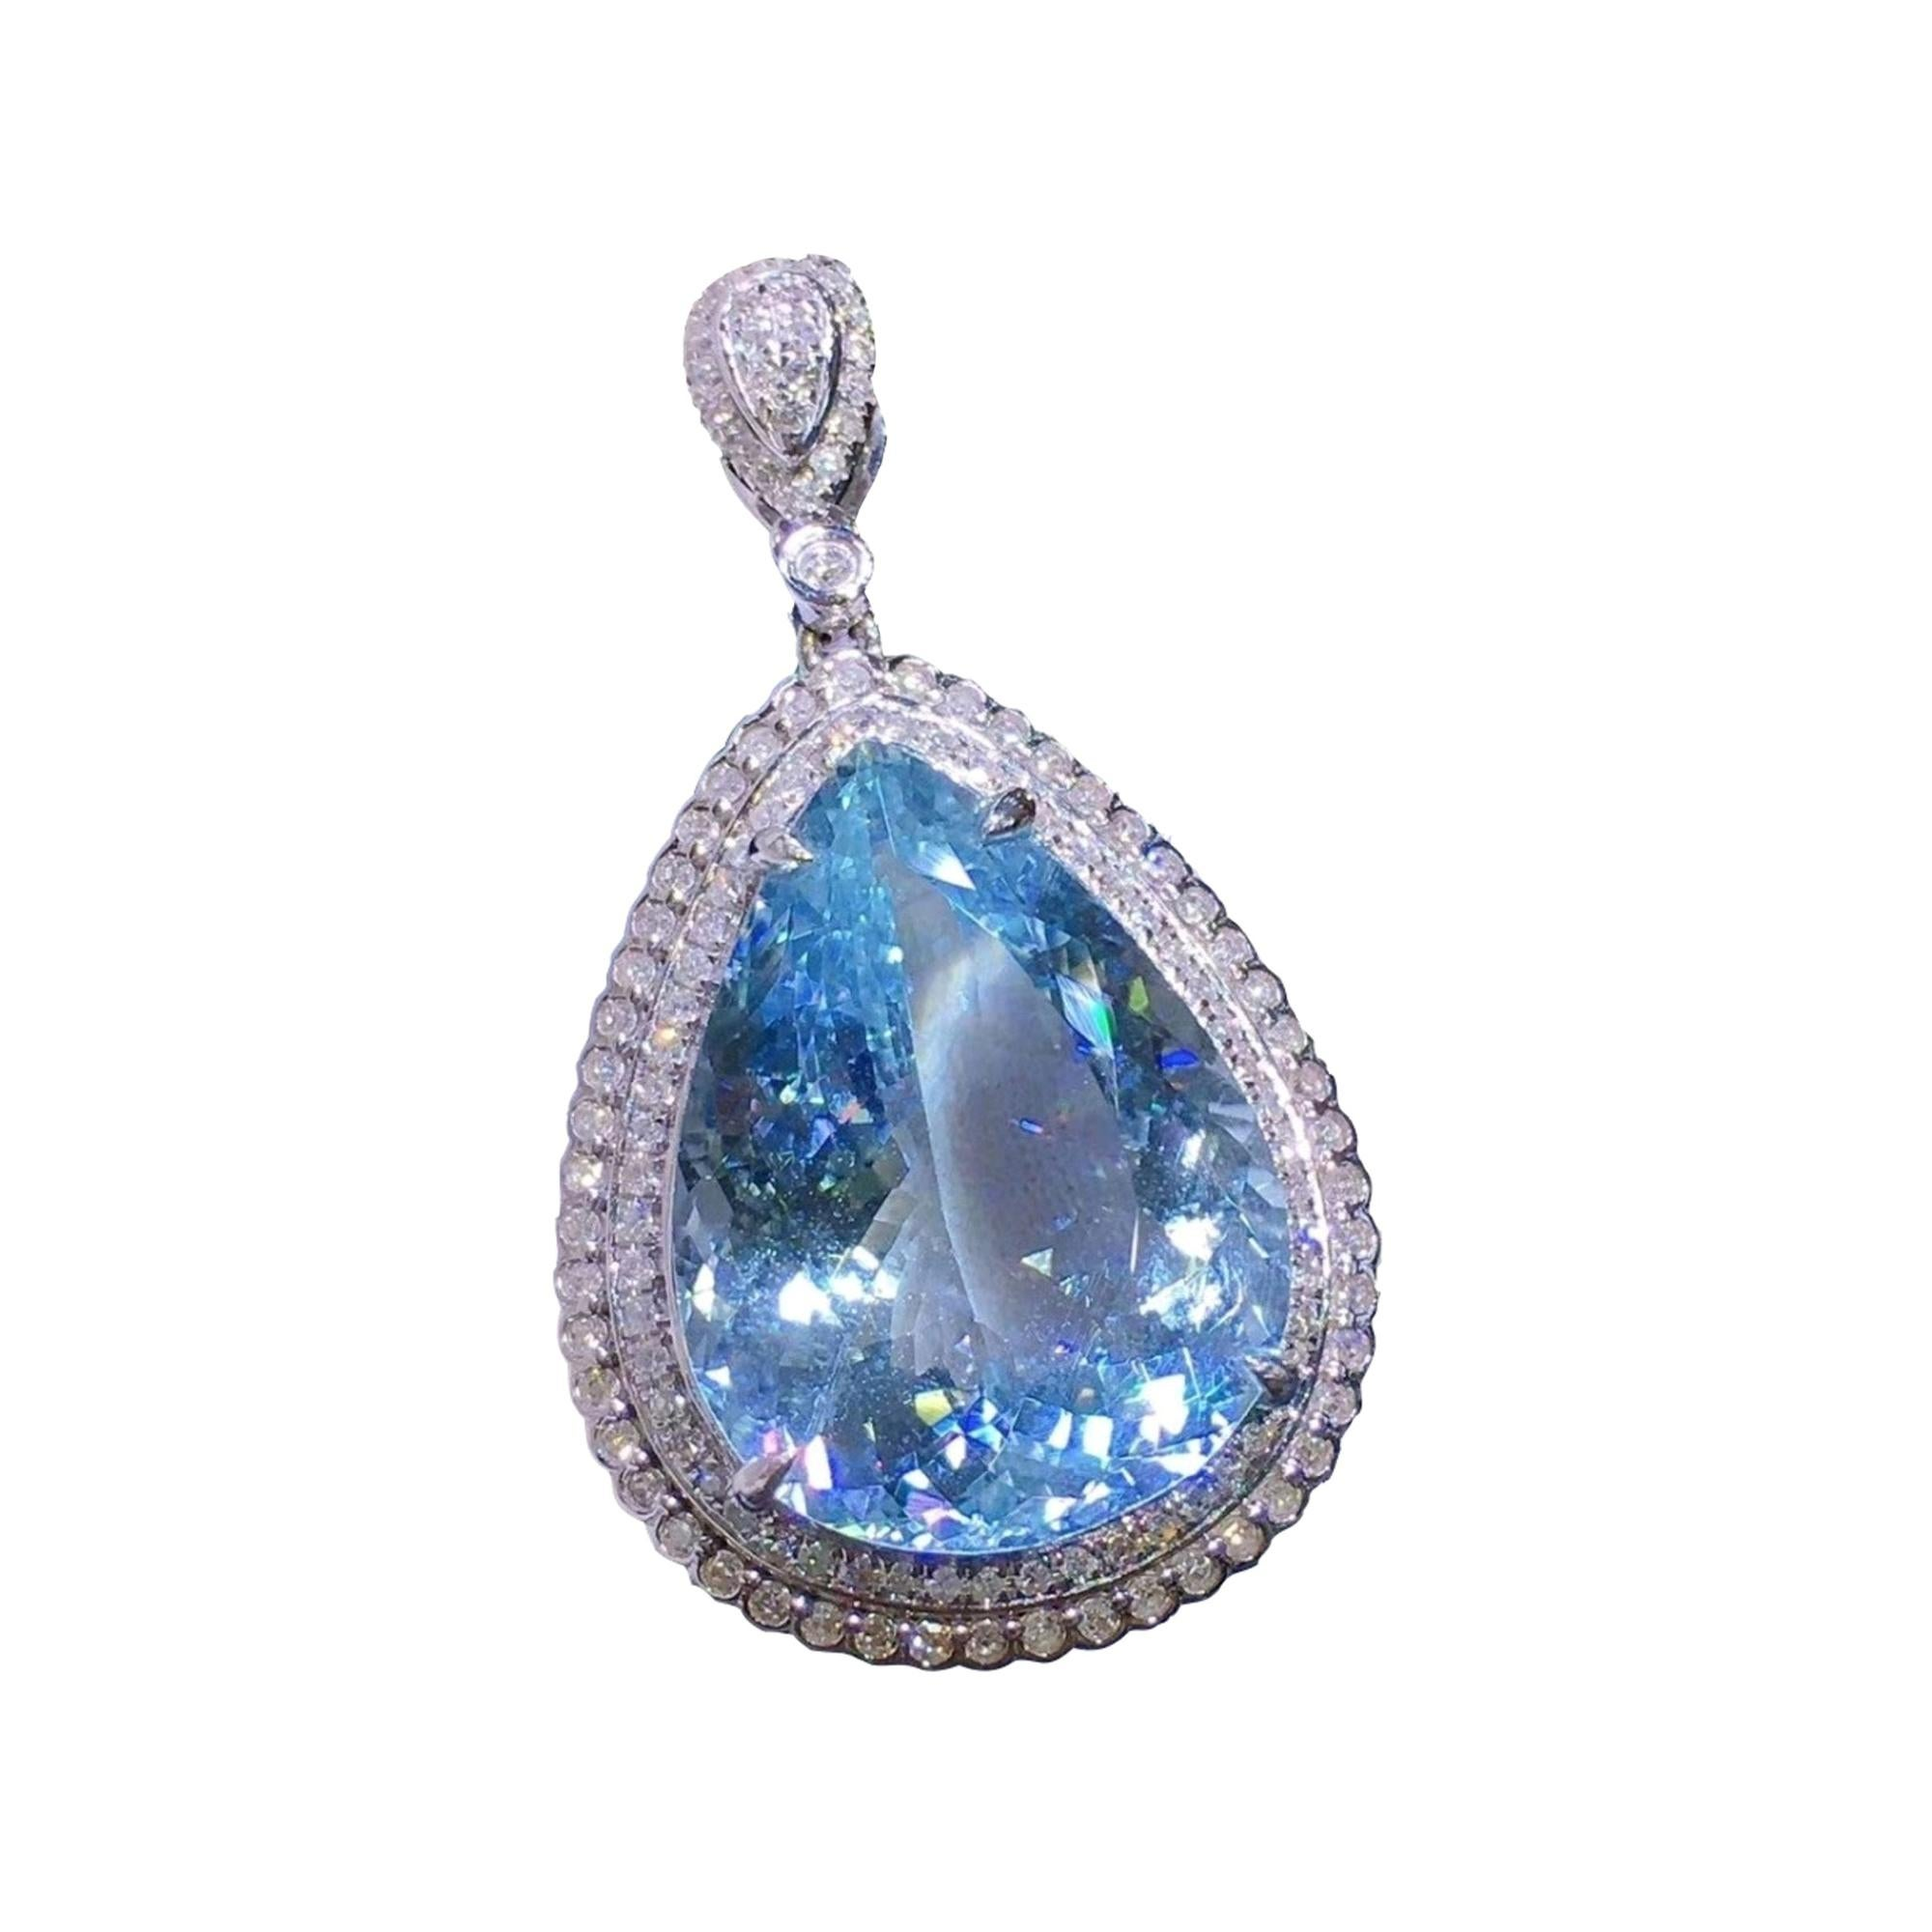 Aquamarine Diamond Pendant and Chain 18K White Gold